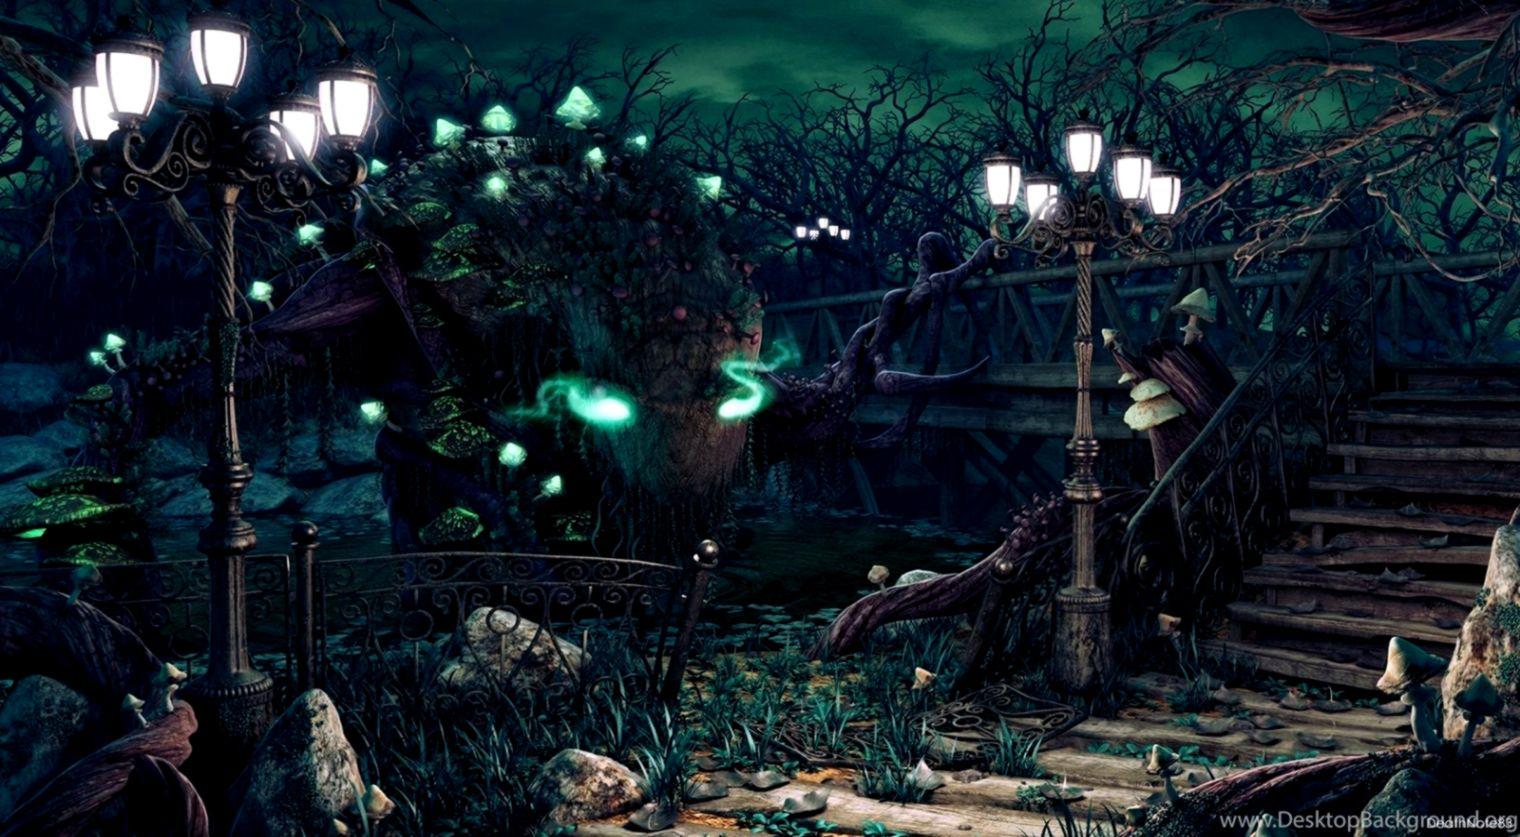 Dreamy Fantasy Forest Magic Artwork Wallpaper Net Wallpapers